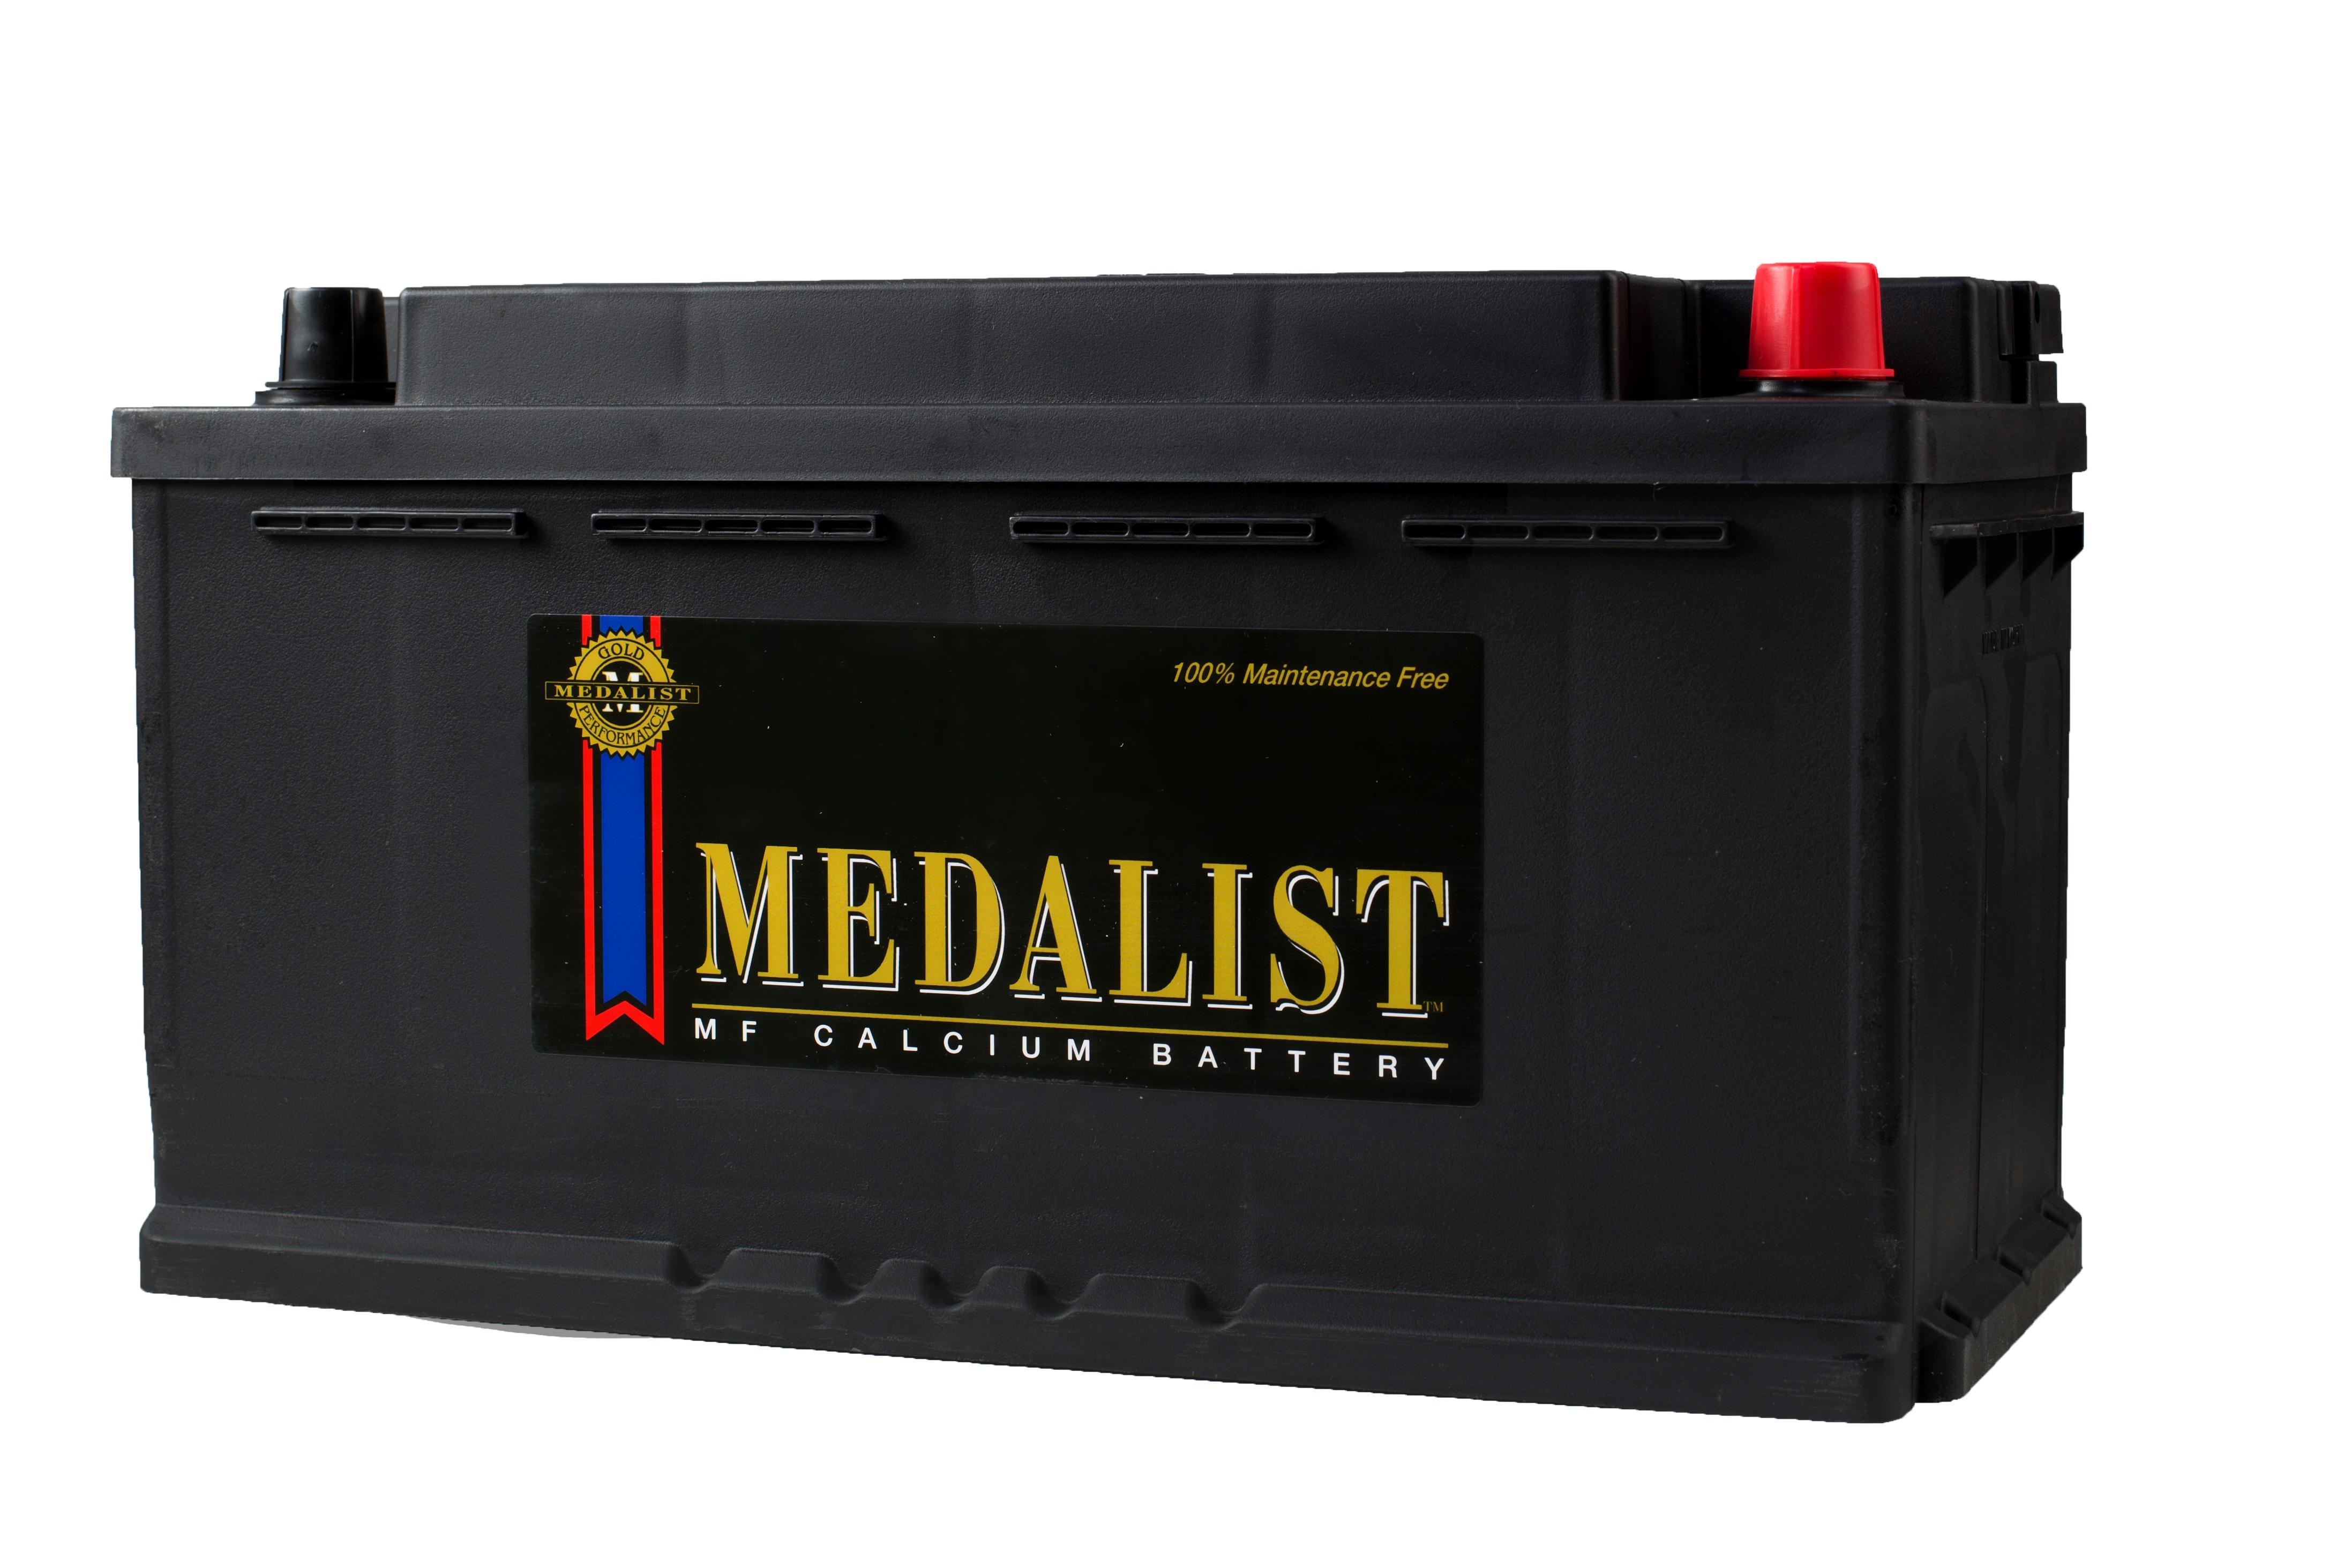 корейские автомобильные аккумуляторы Medalist